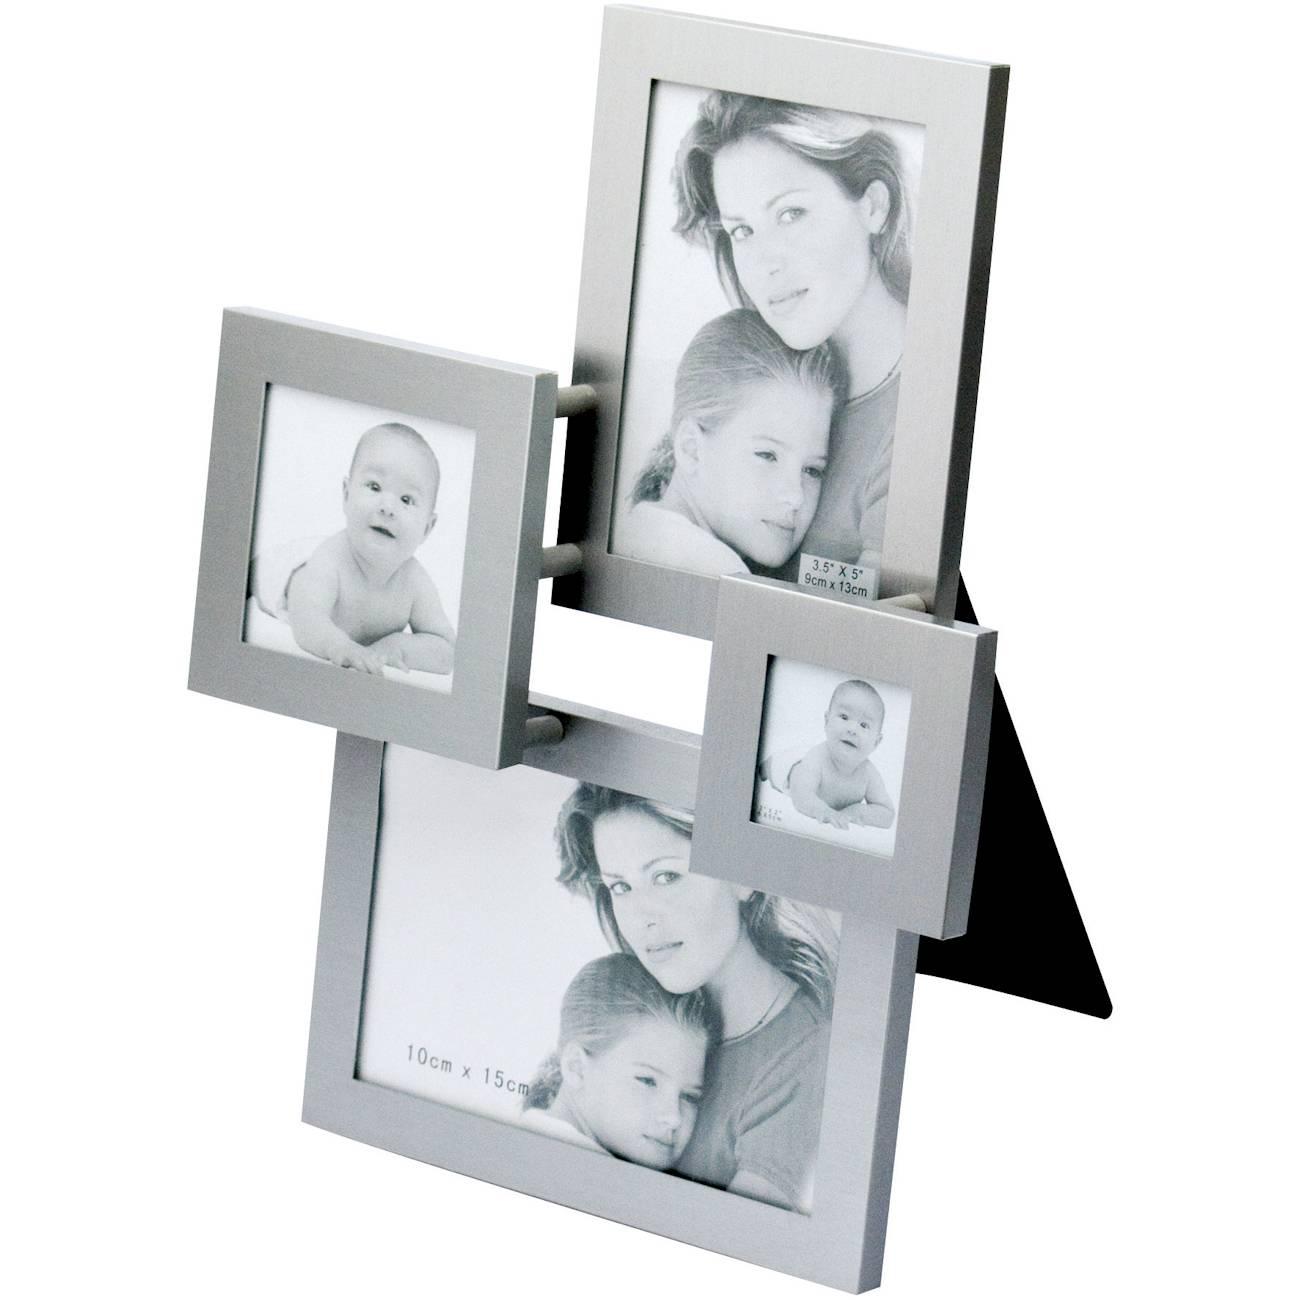 Porta-Retrato Square - para 4 Fotos - em Alúminio Escovado - Prestige